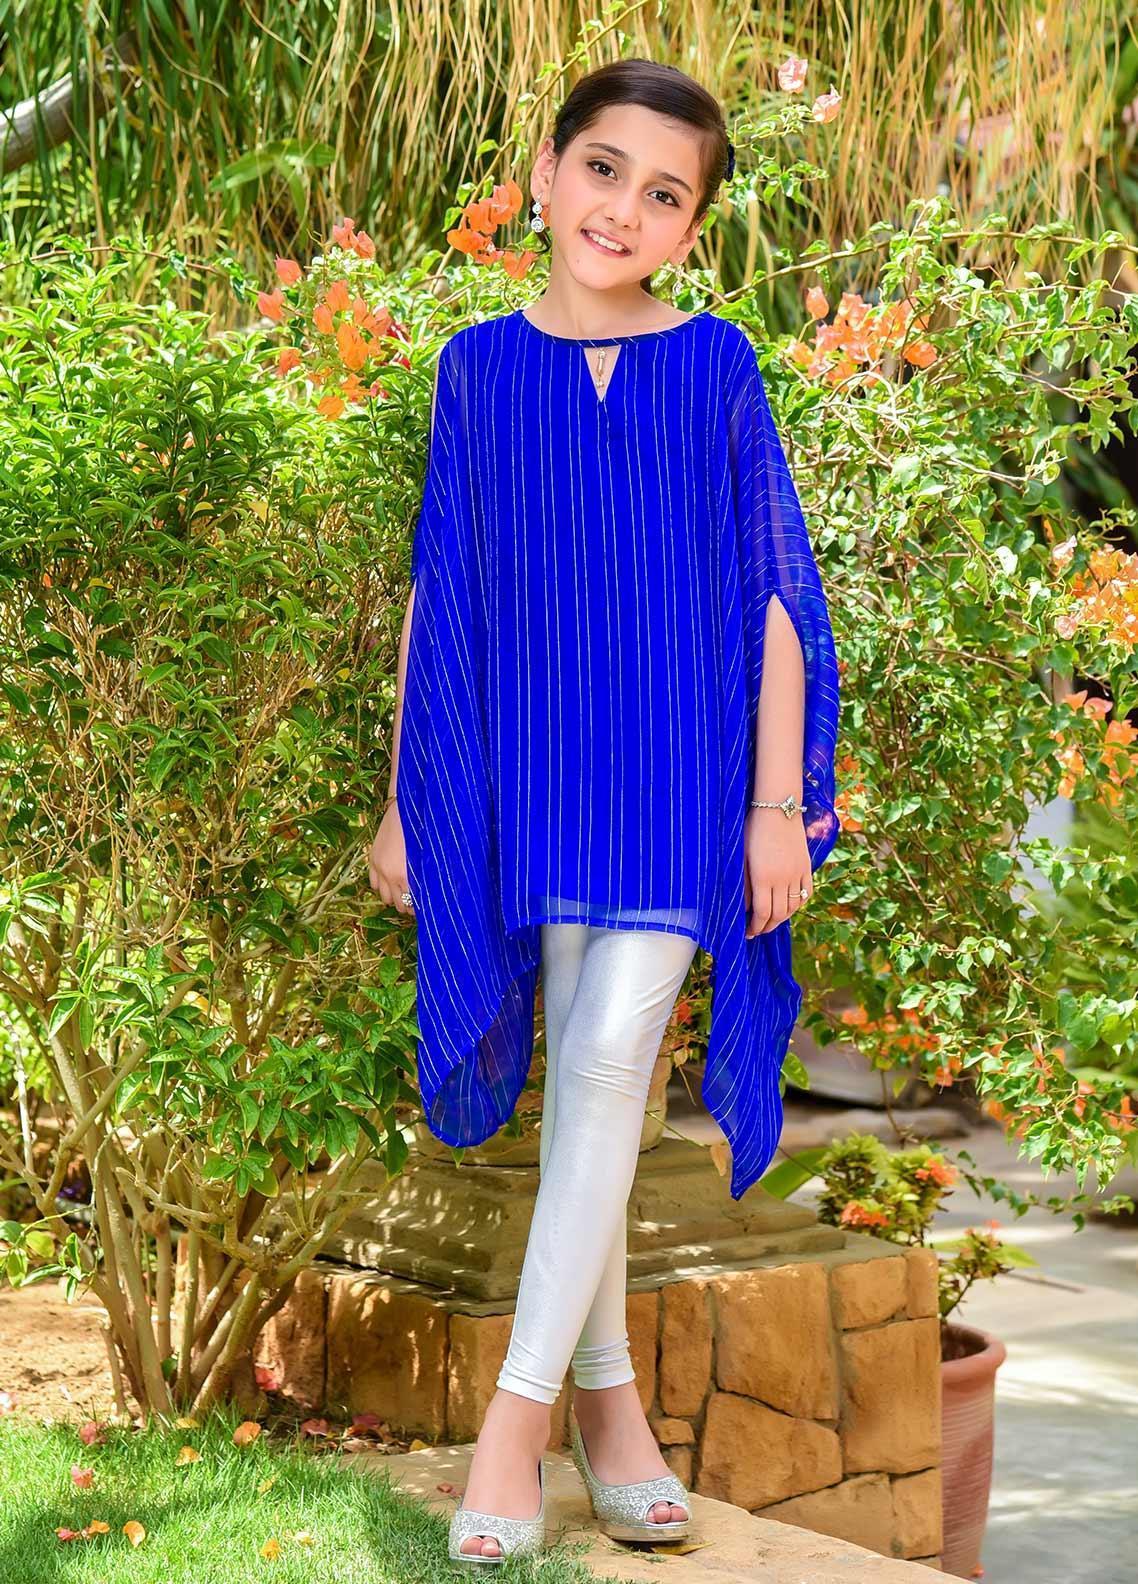 Ochre Chiffon Fancy Girls Kurtis -  OFK 723 Royal Blue